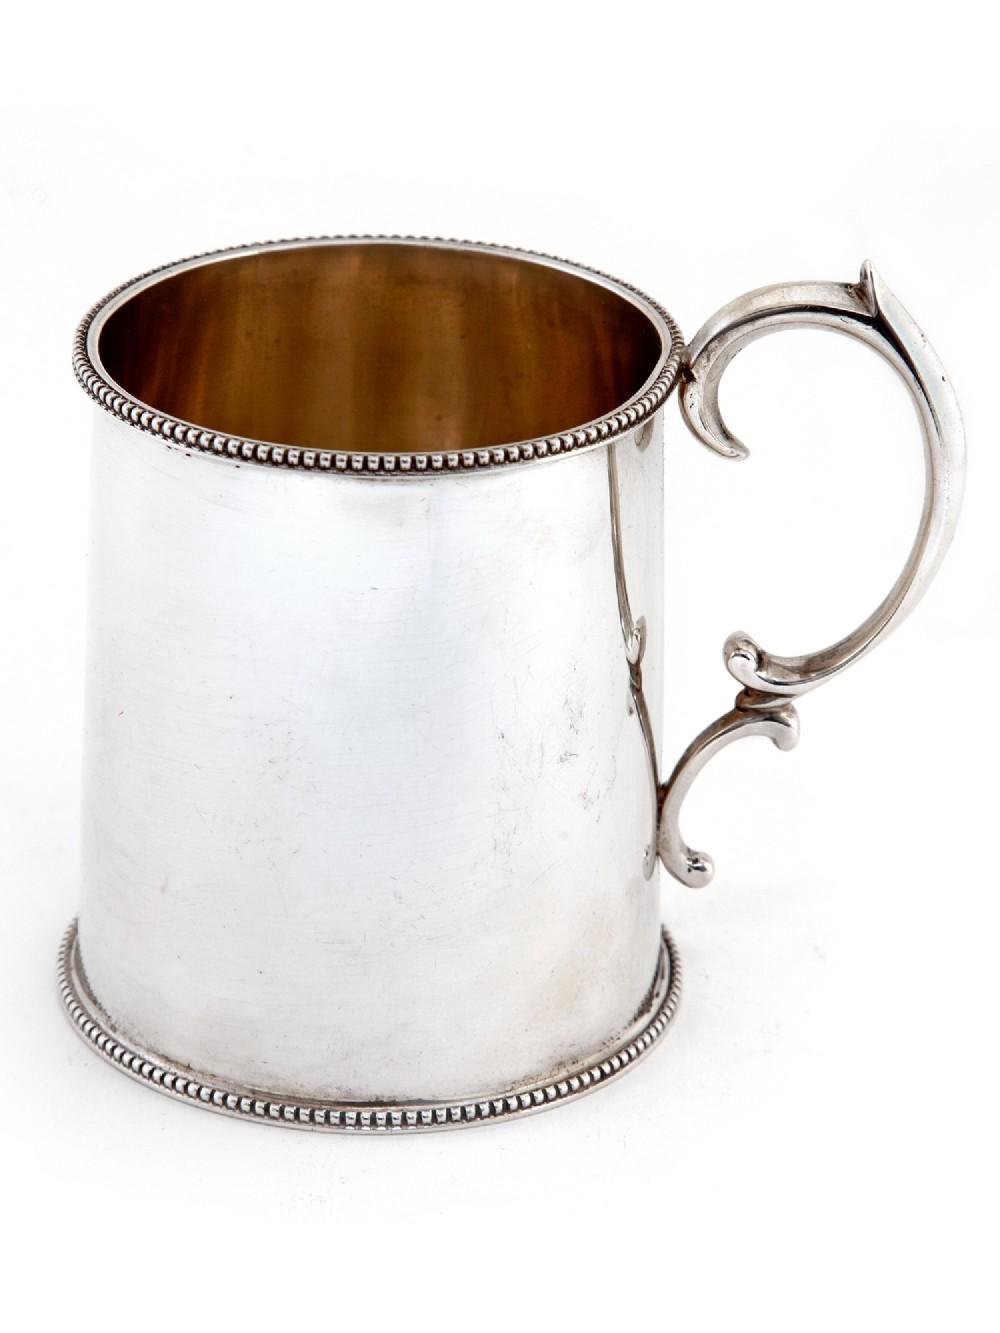 plain edwardian silver christening mug with scroll handle